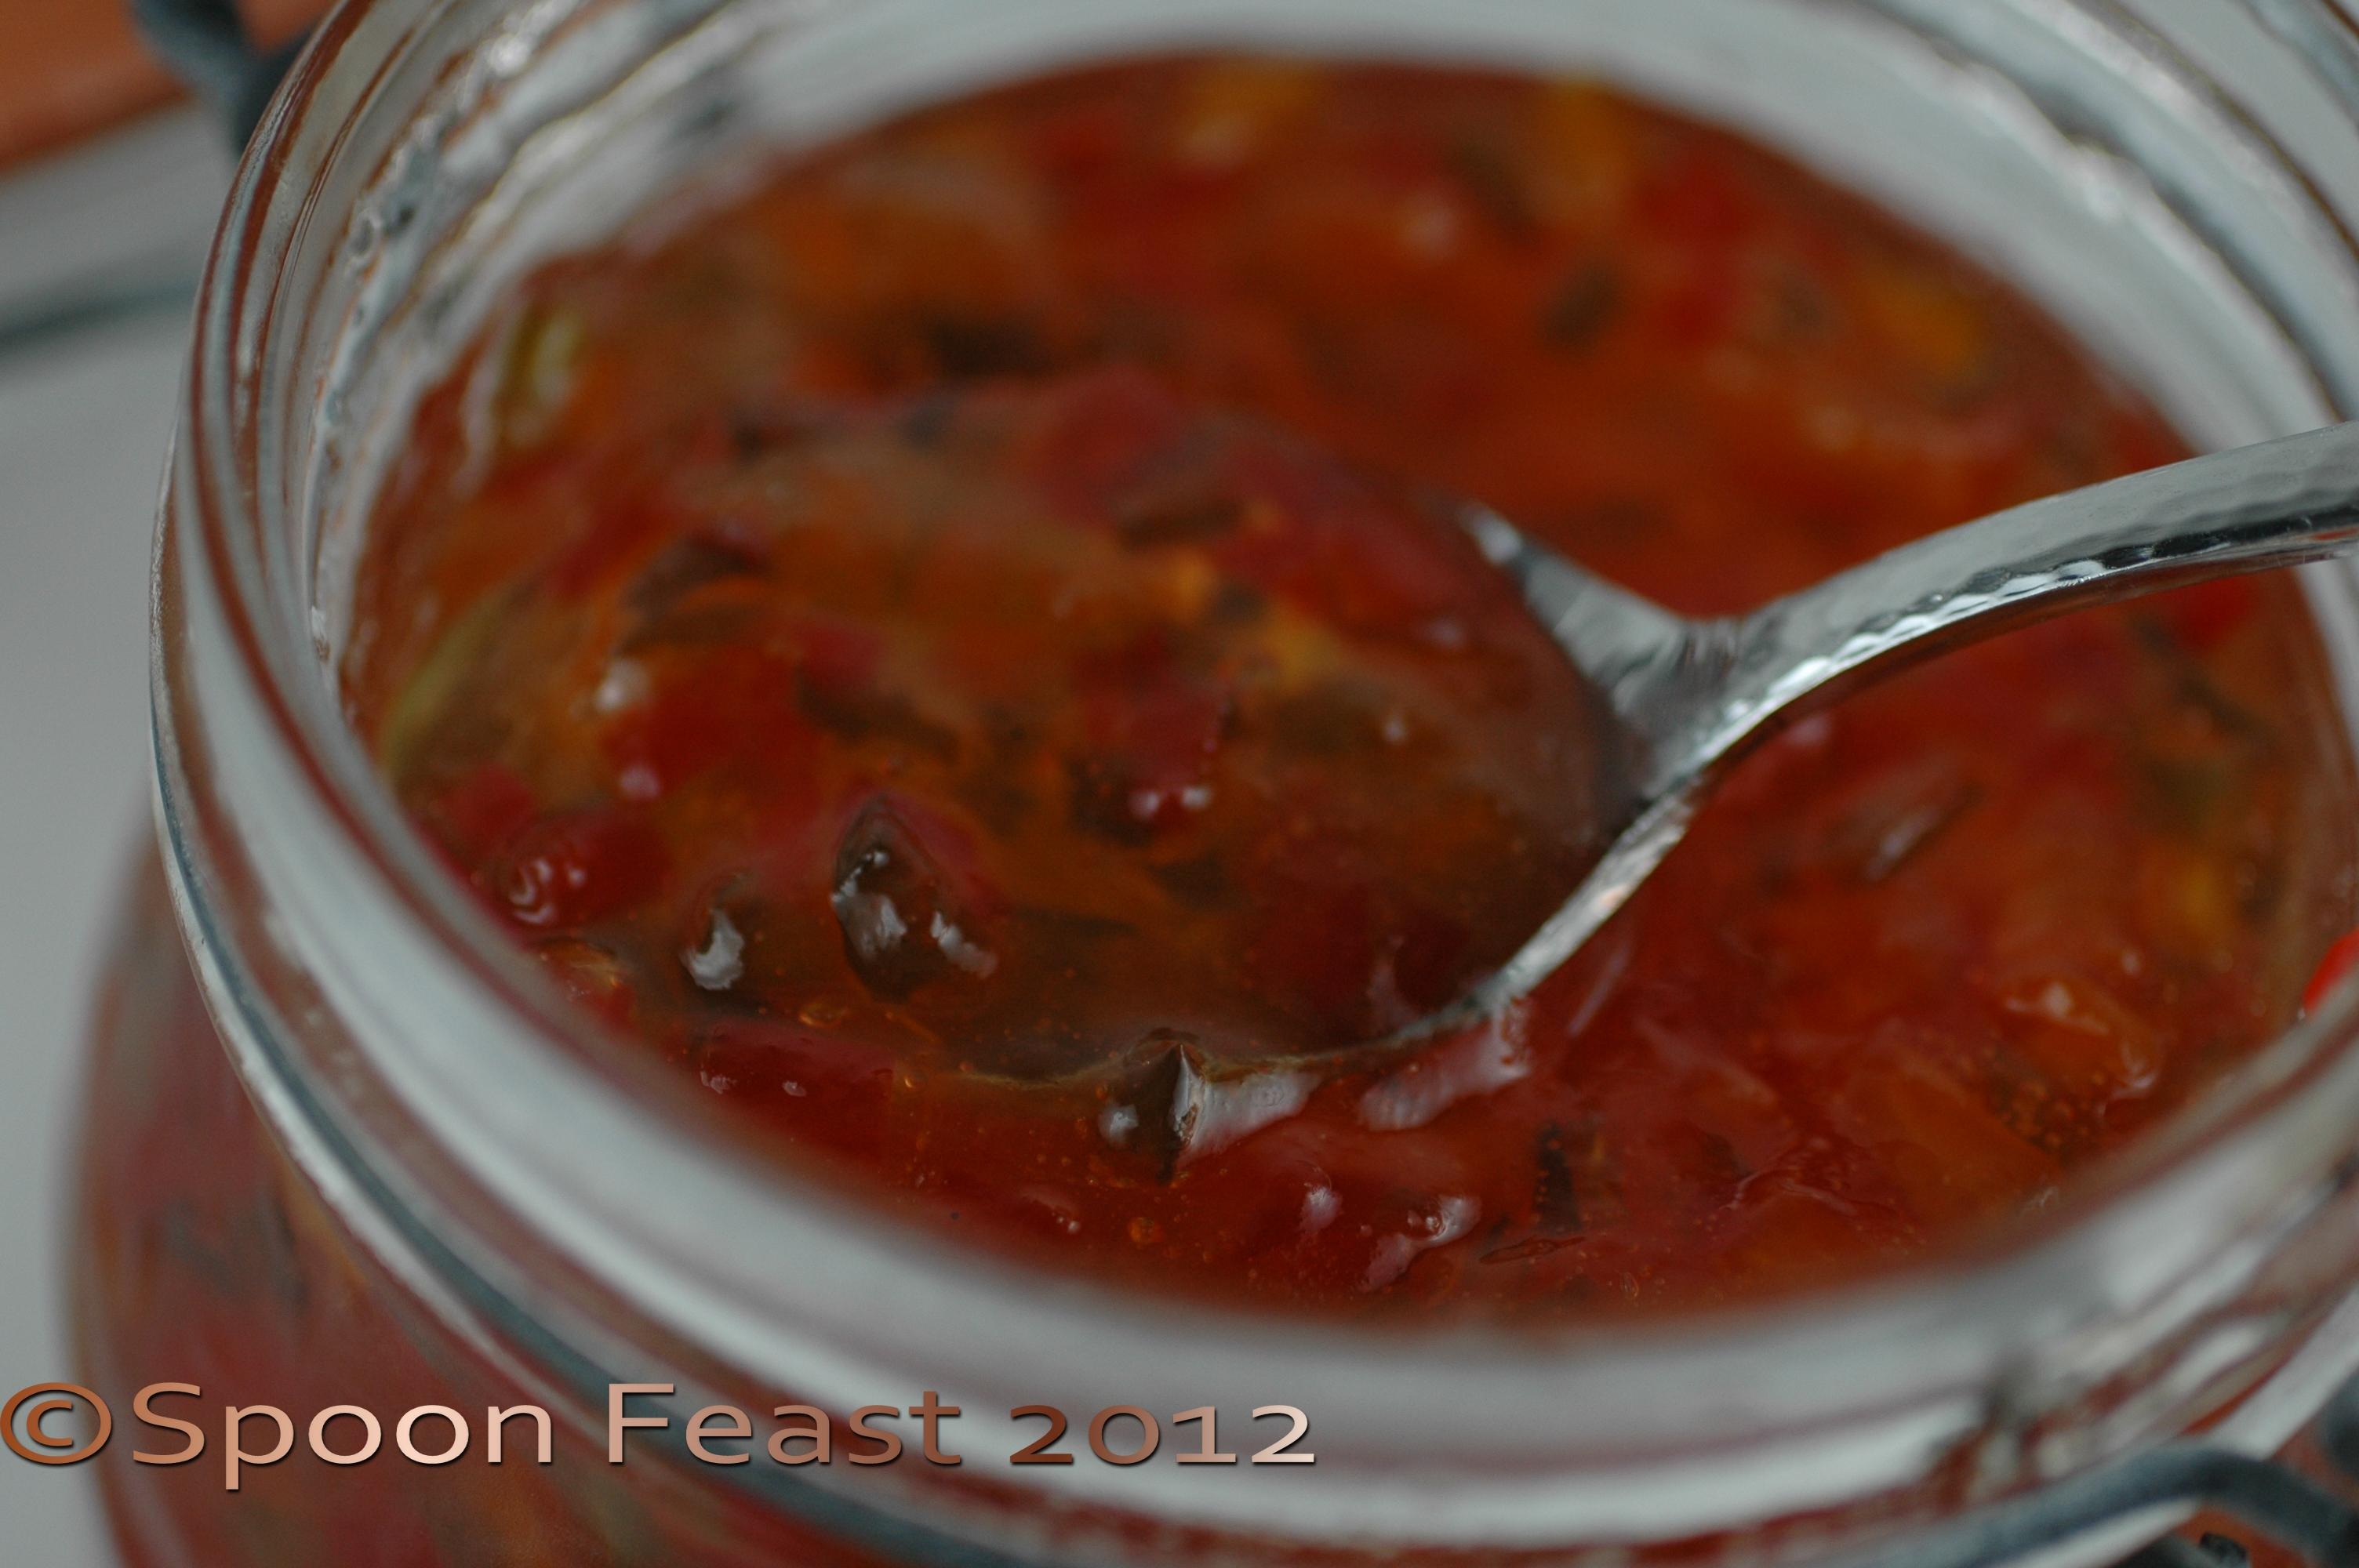 hot jalapeno jelly hoppin jalapeno pepper jelly jalapeno pepper jelly ...